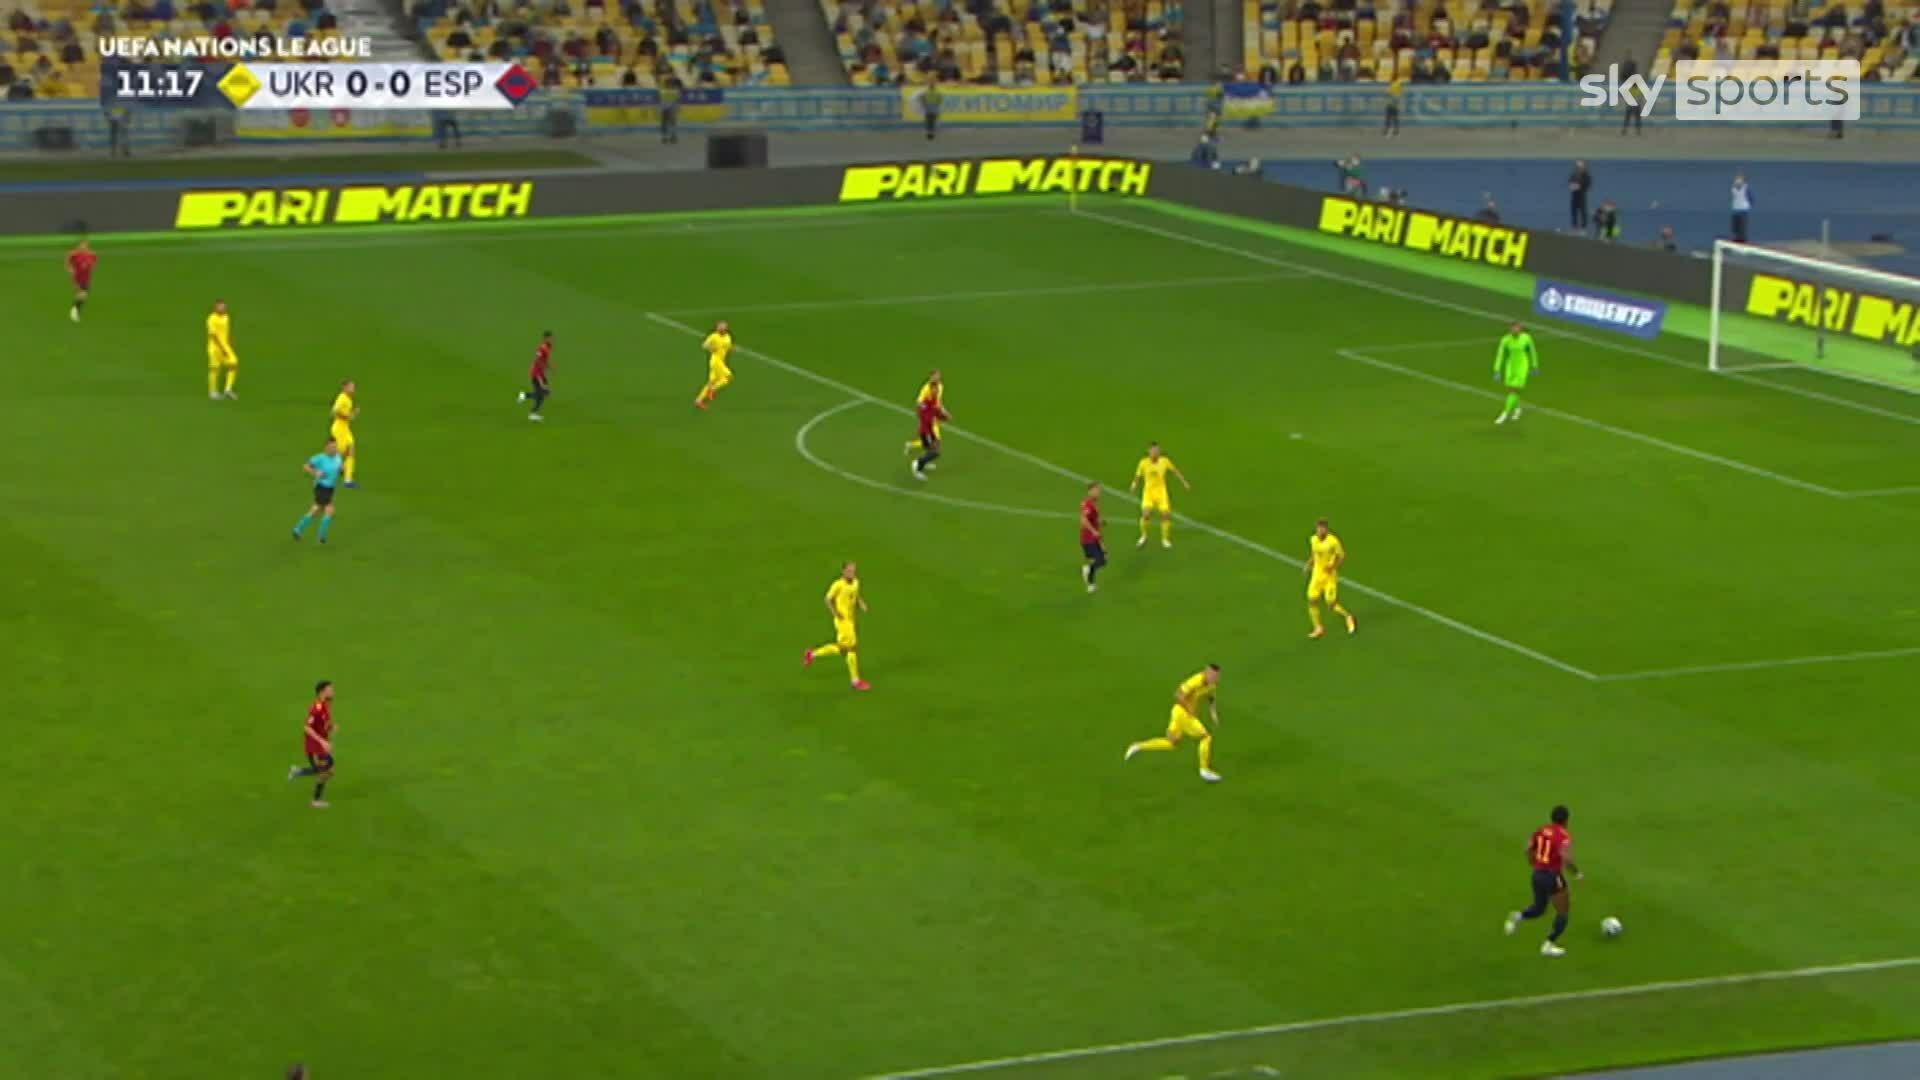 Ukraine 1-0 Tây Ban Nha